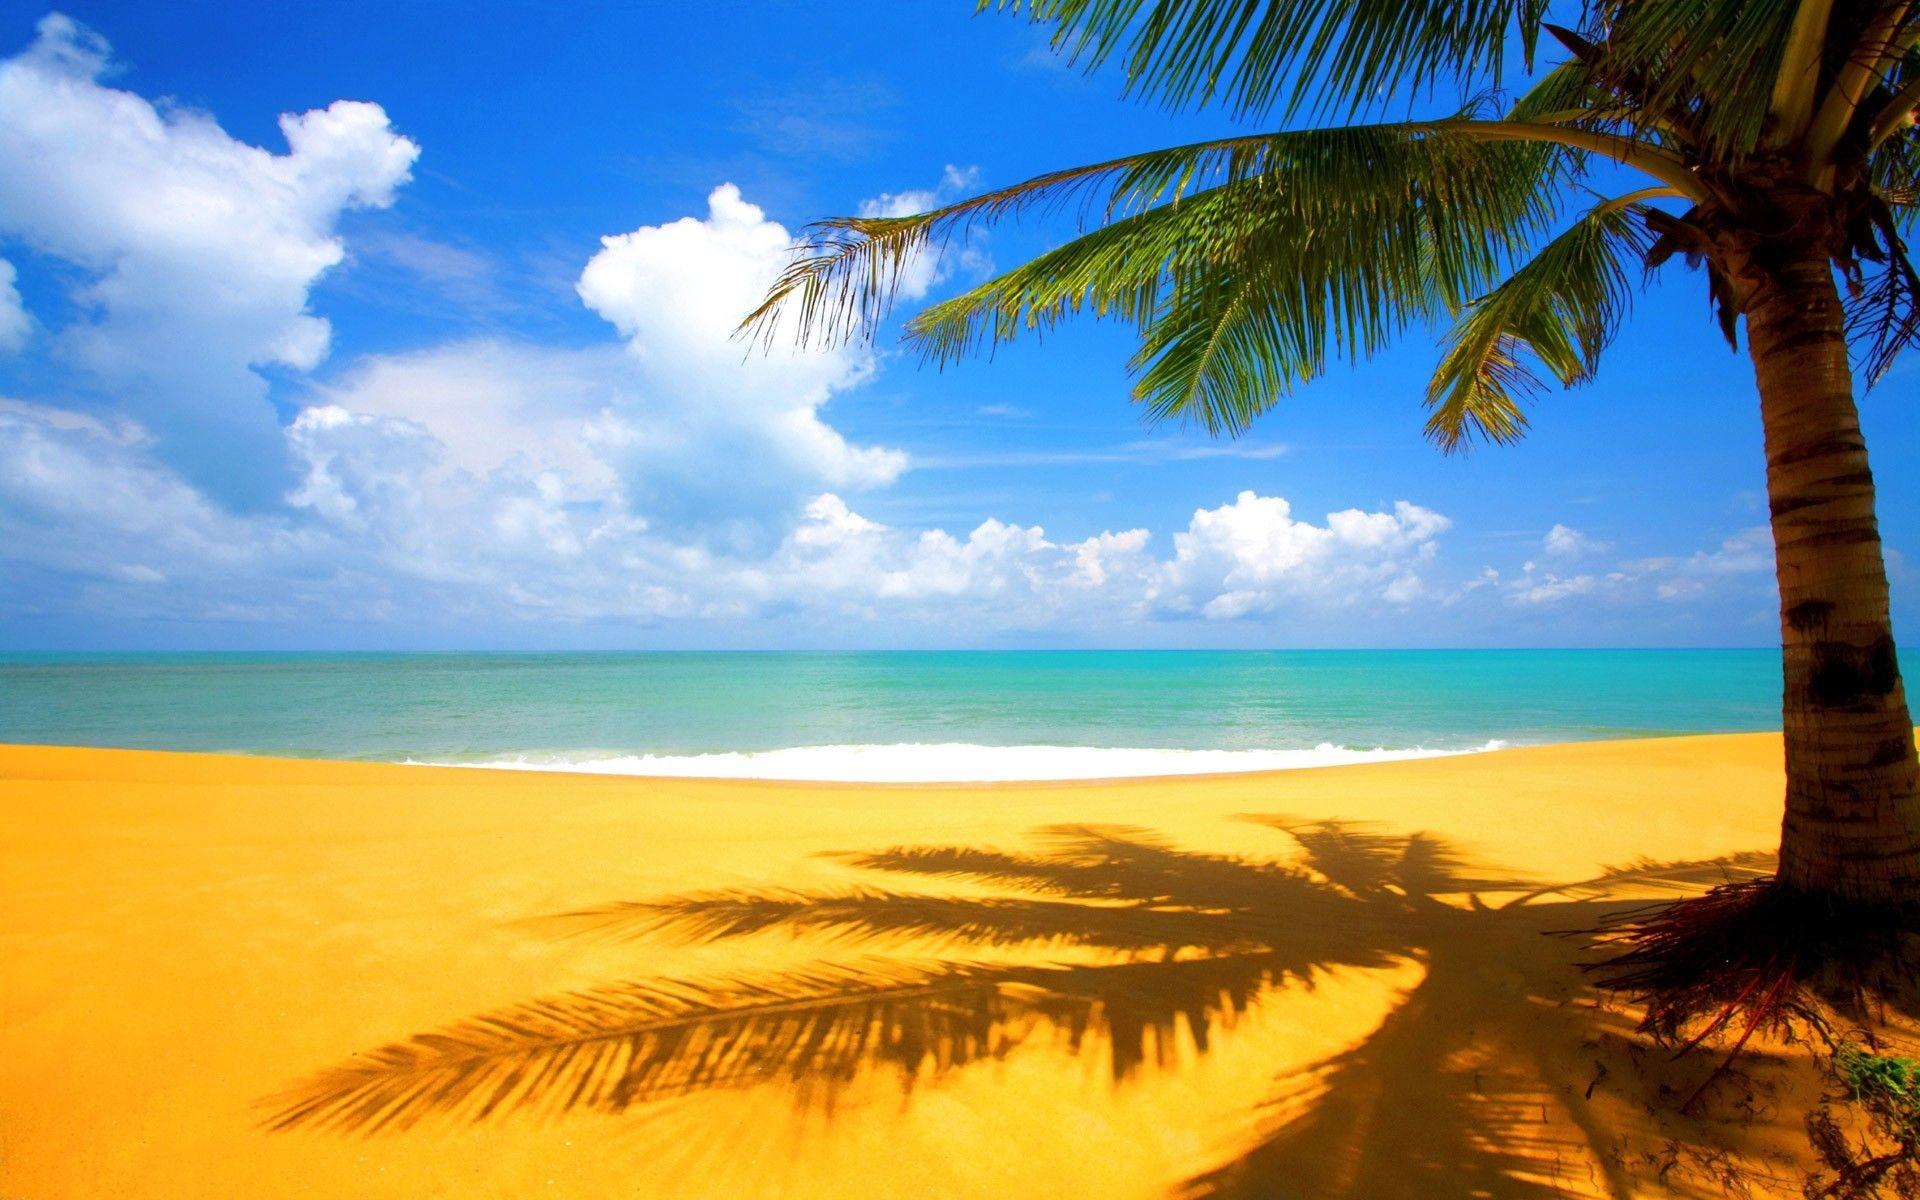 1920x1200, Hd Wallpaper Background, Beach Hd For Pc - Beach And Palm Trees Background - HD Wallpaper